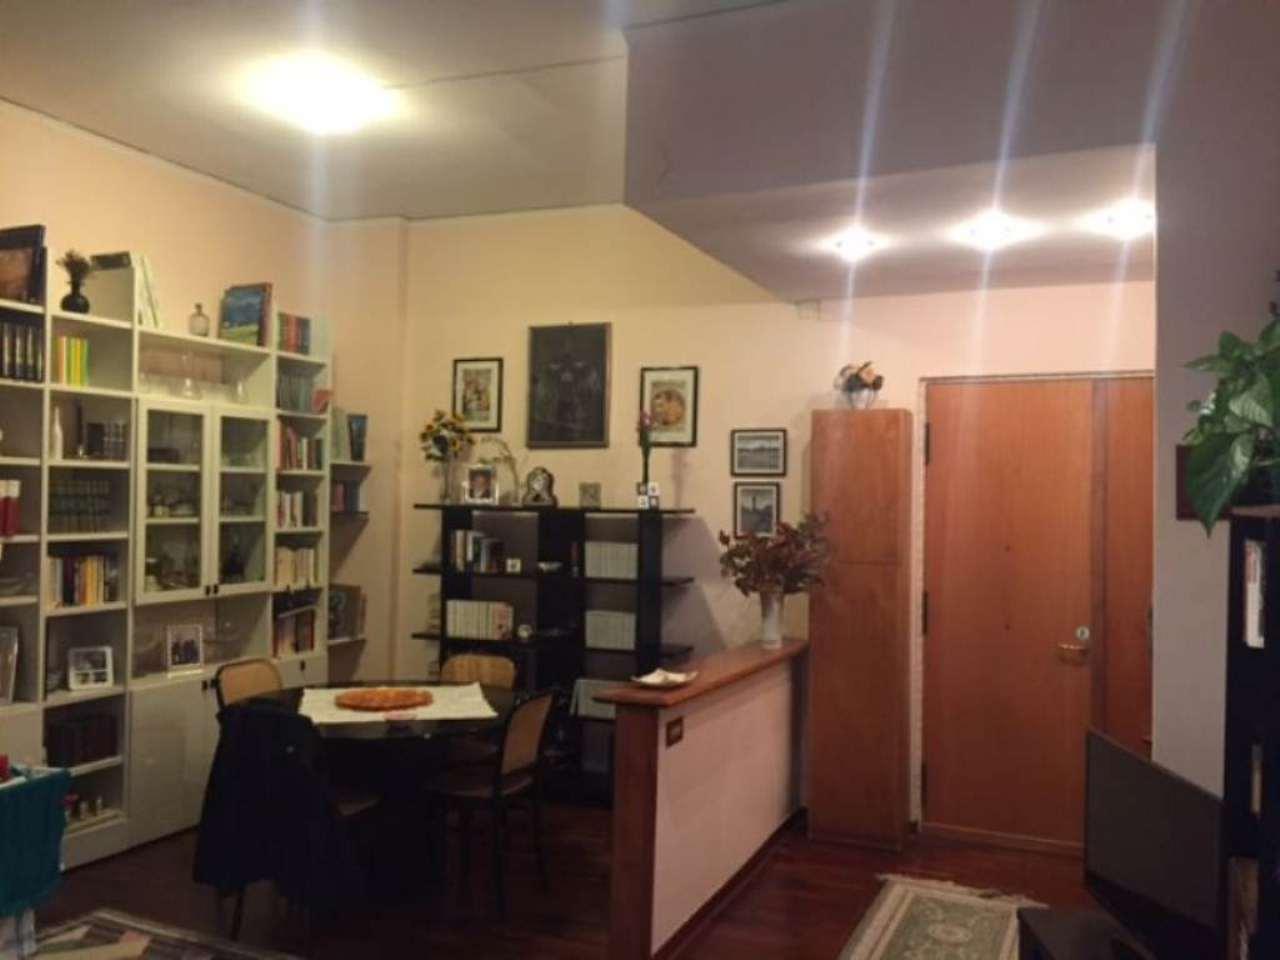 Bilocale Napoli Via Luca Giordano 3